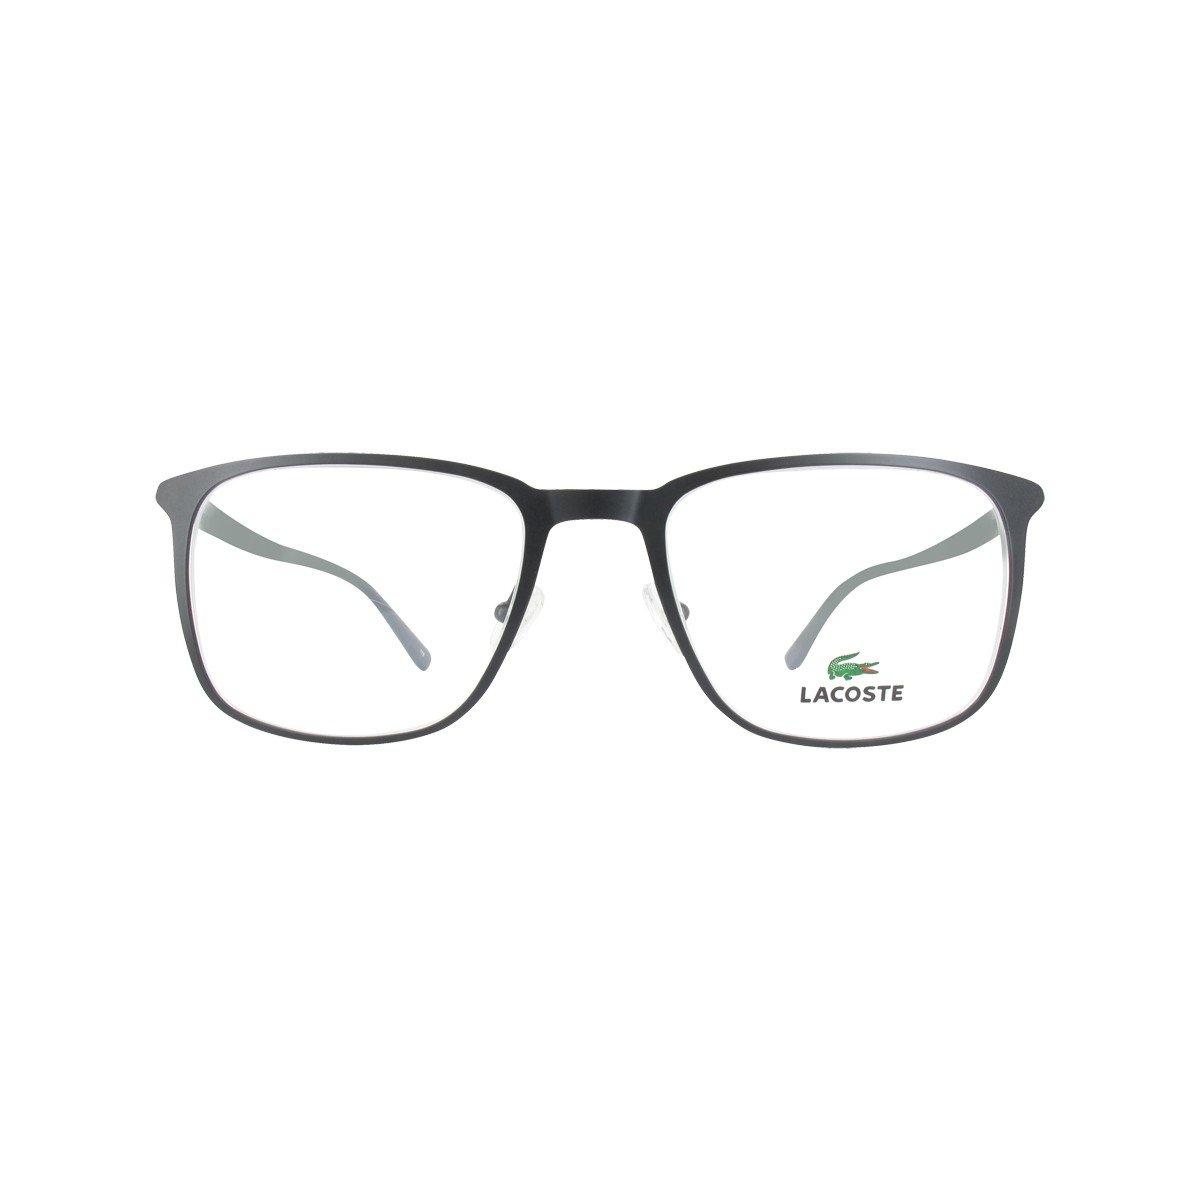 d1b9a5e101b0 LACOSTE Eyeglasses L2219 001 Matte Black MM  Amazon.ca  Clothing    Accessories